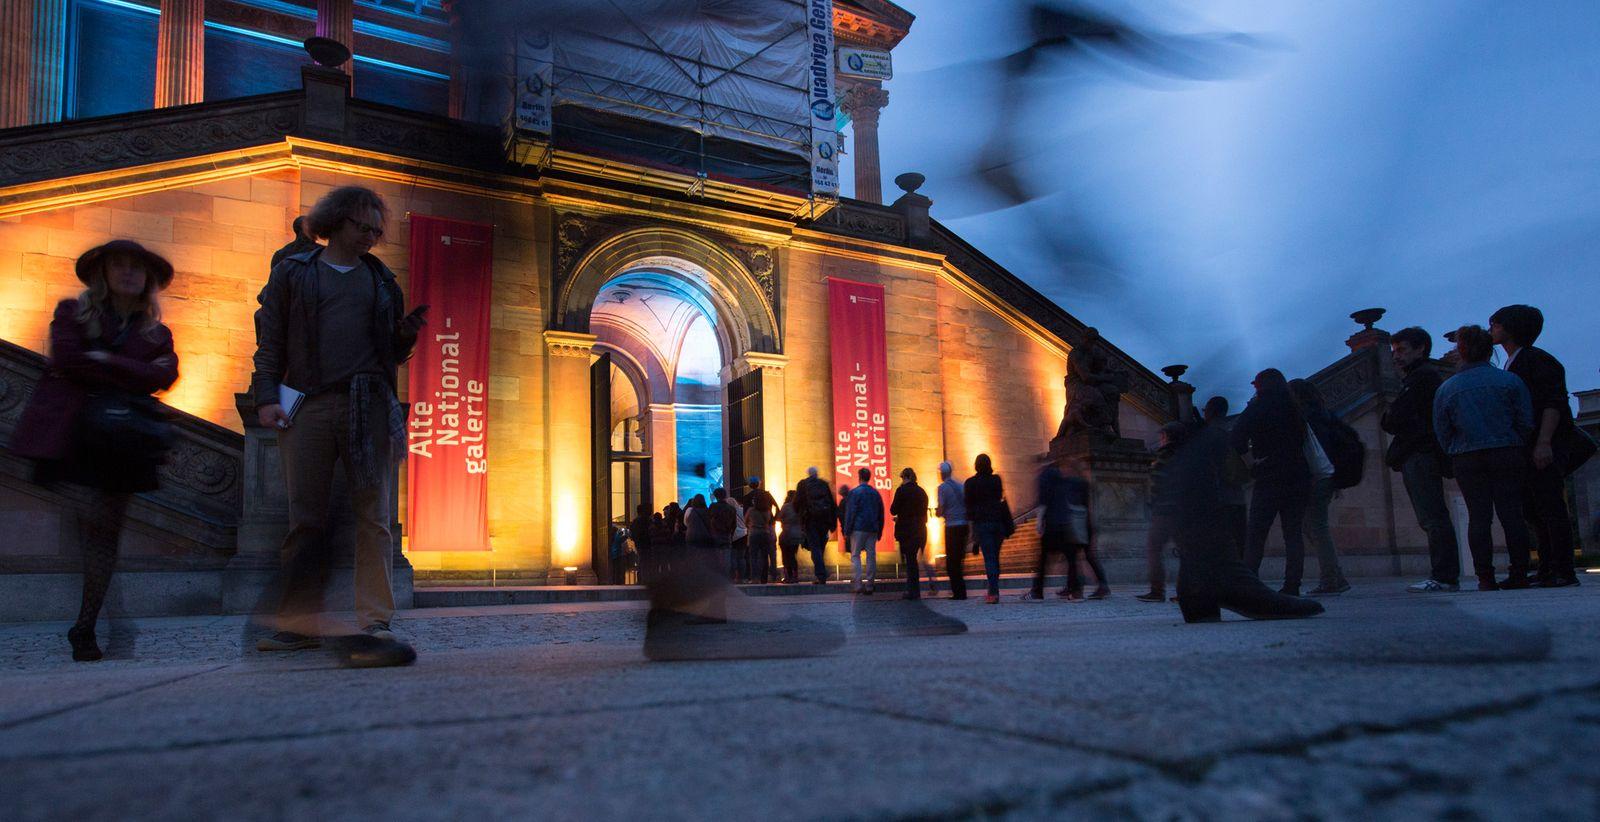 2014 / Film / Reise / Nachts im Museum 3